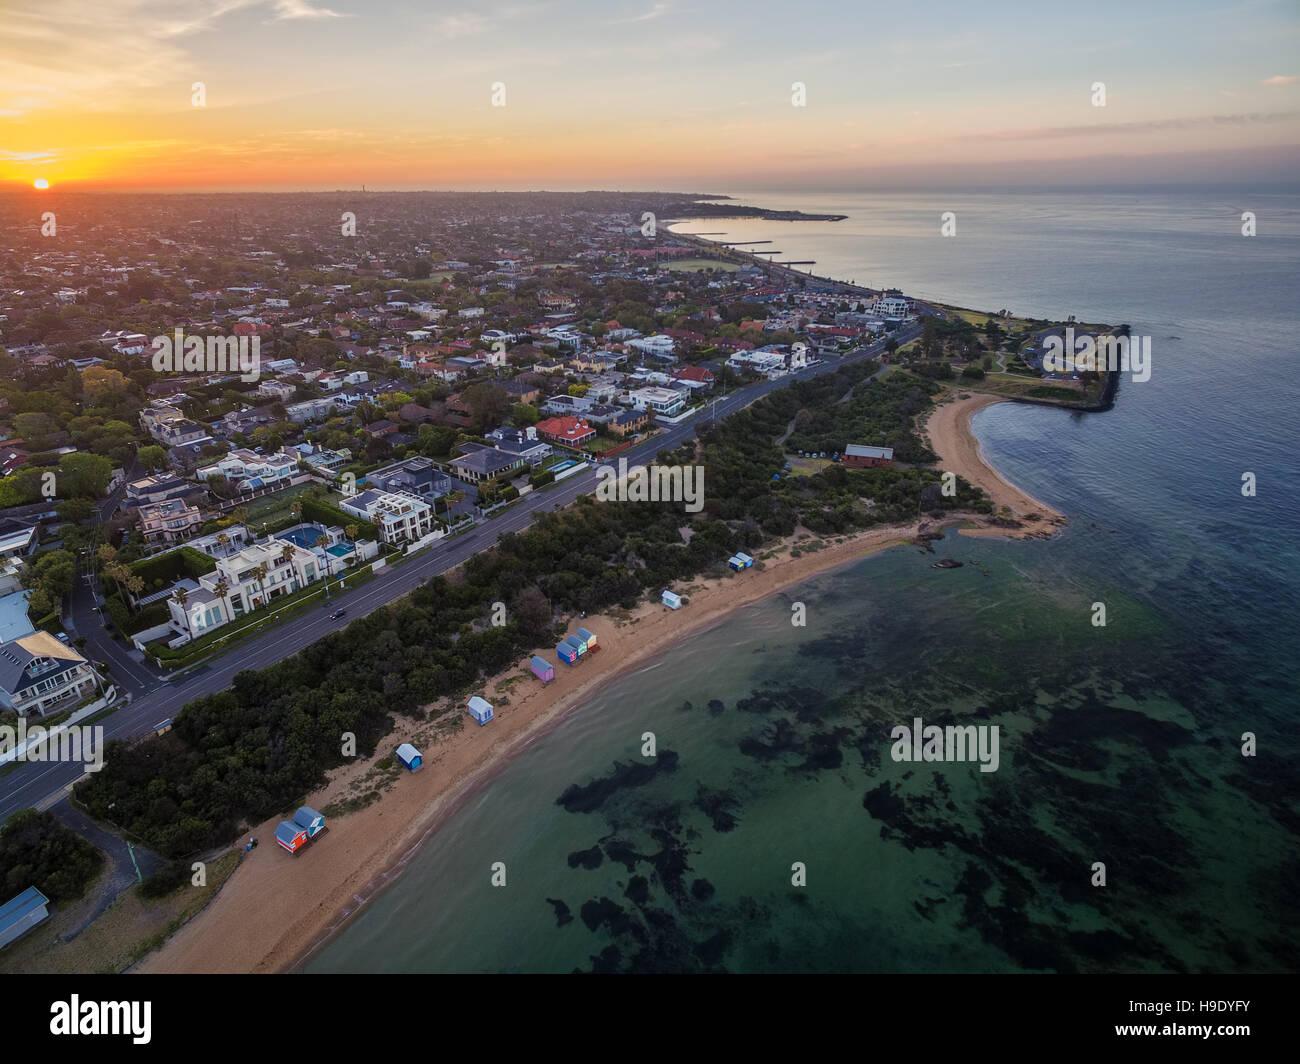 Aerial view of sunrise at Brighton Beach coastline. Melbourne, Victoria, Australia. - Stock Image